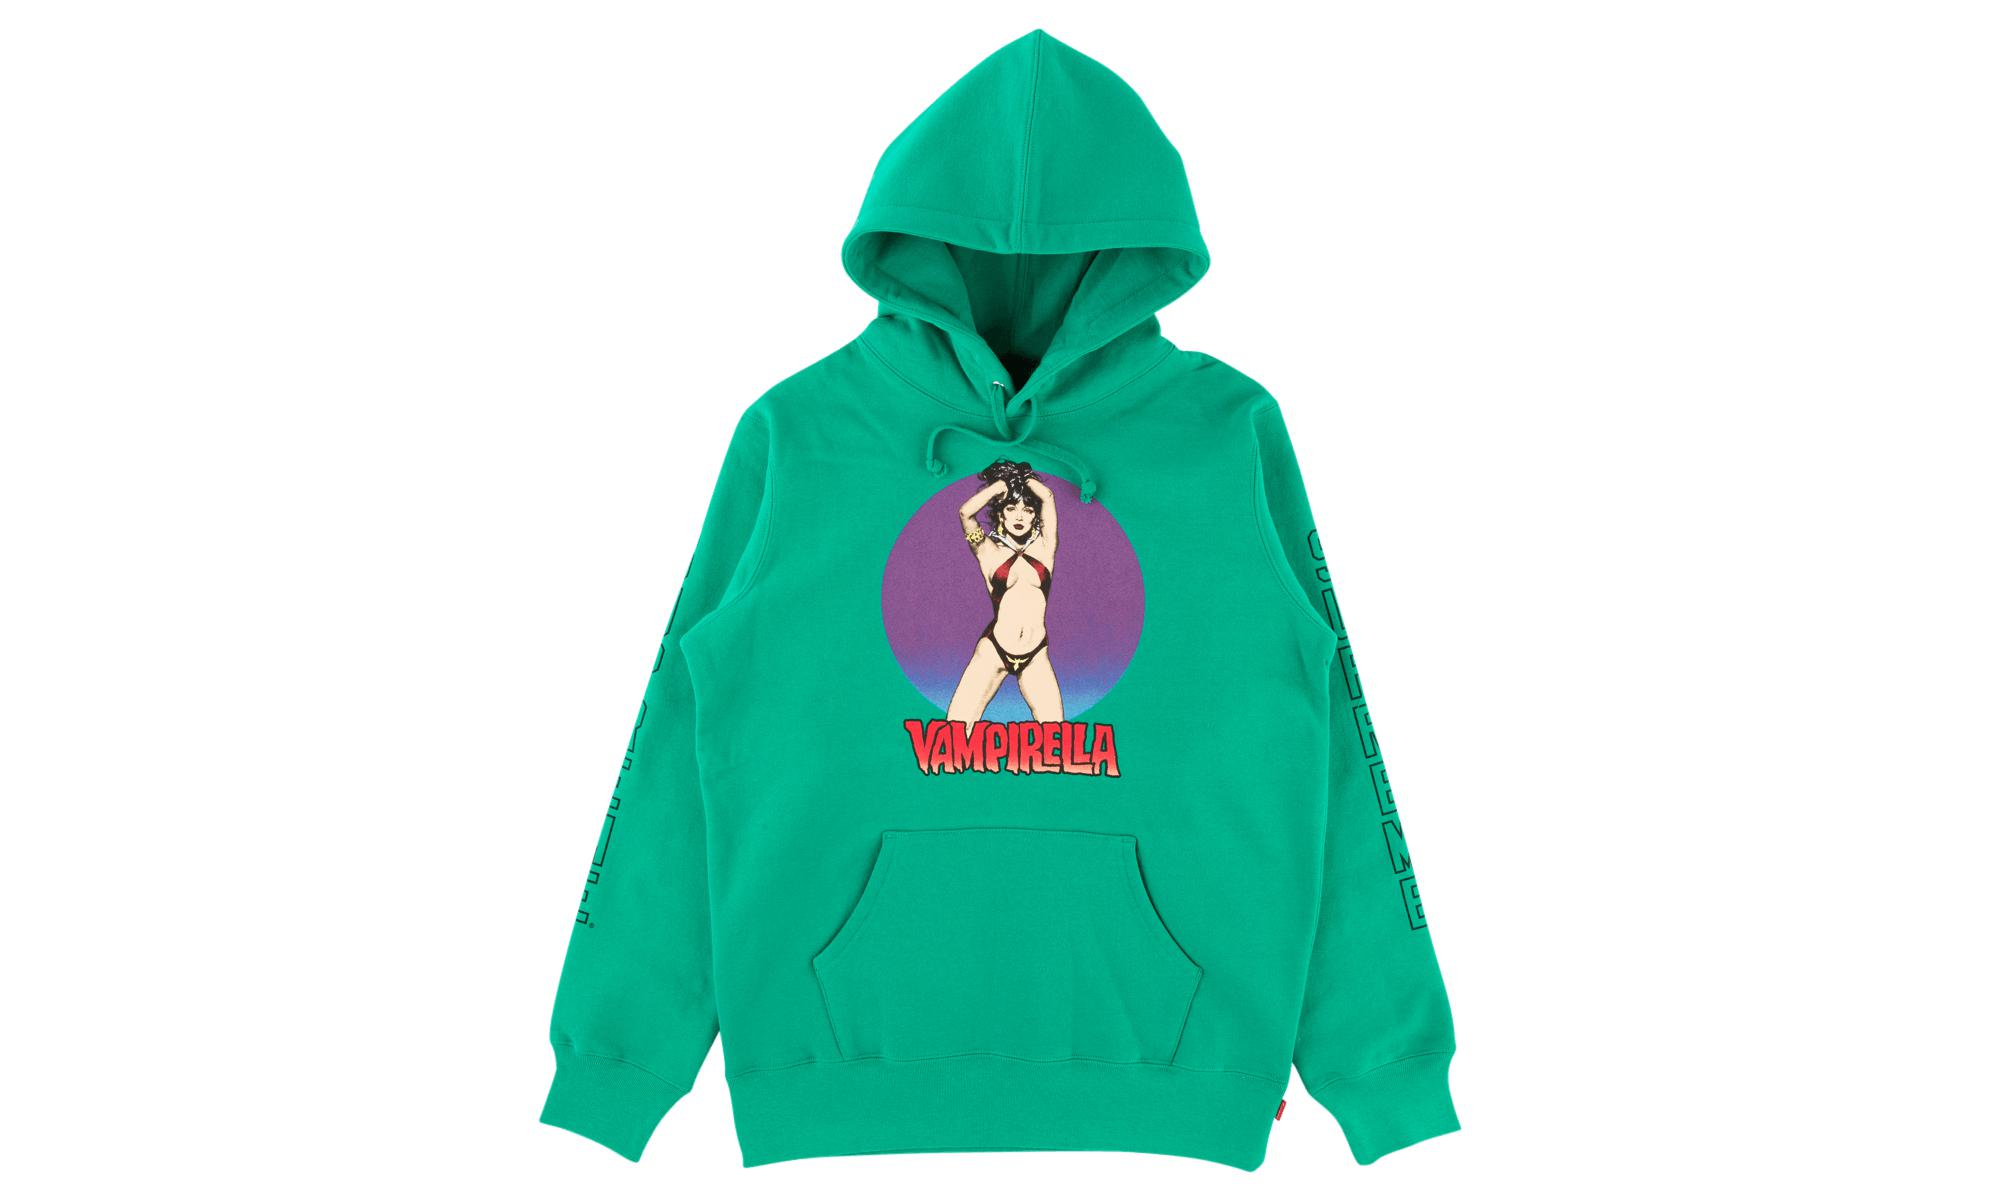 3ffb0be30a68 Lyst - Supreme Vampirella Hooded Sweatshirt in Green